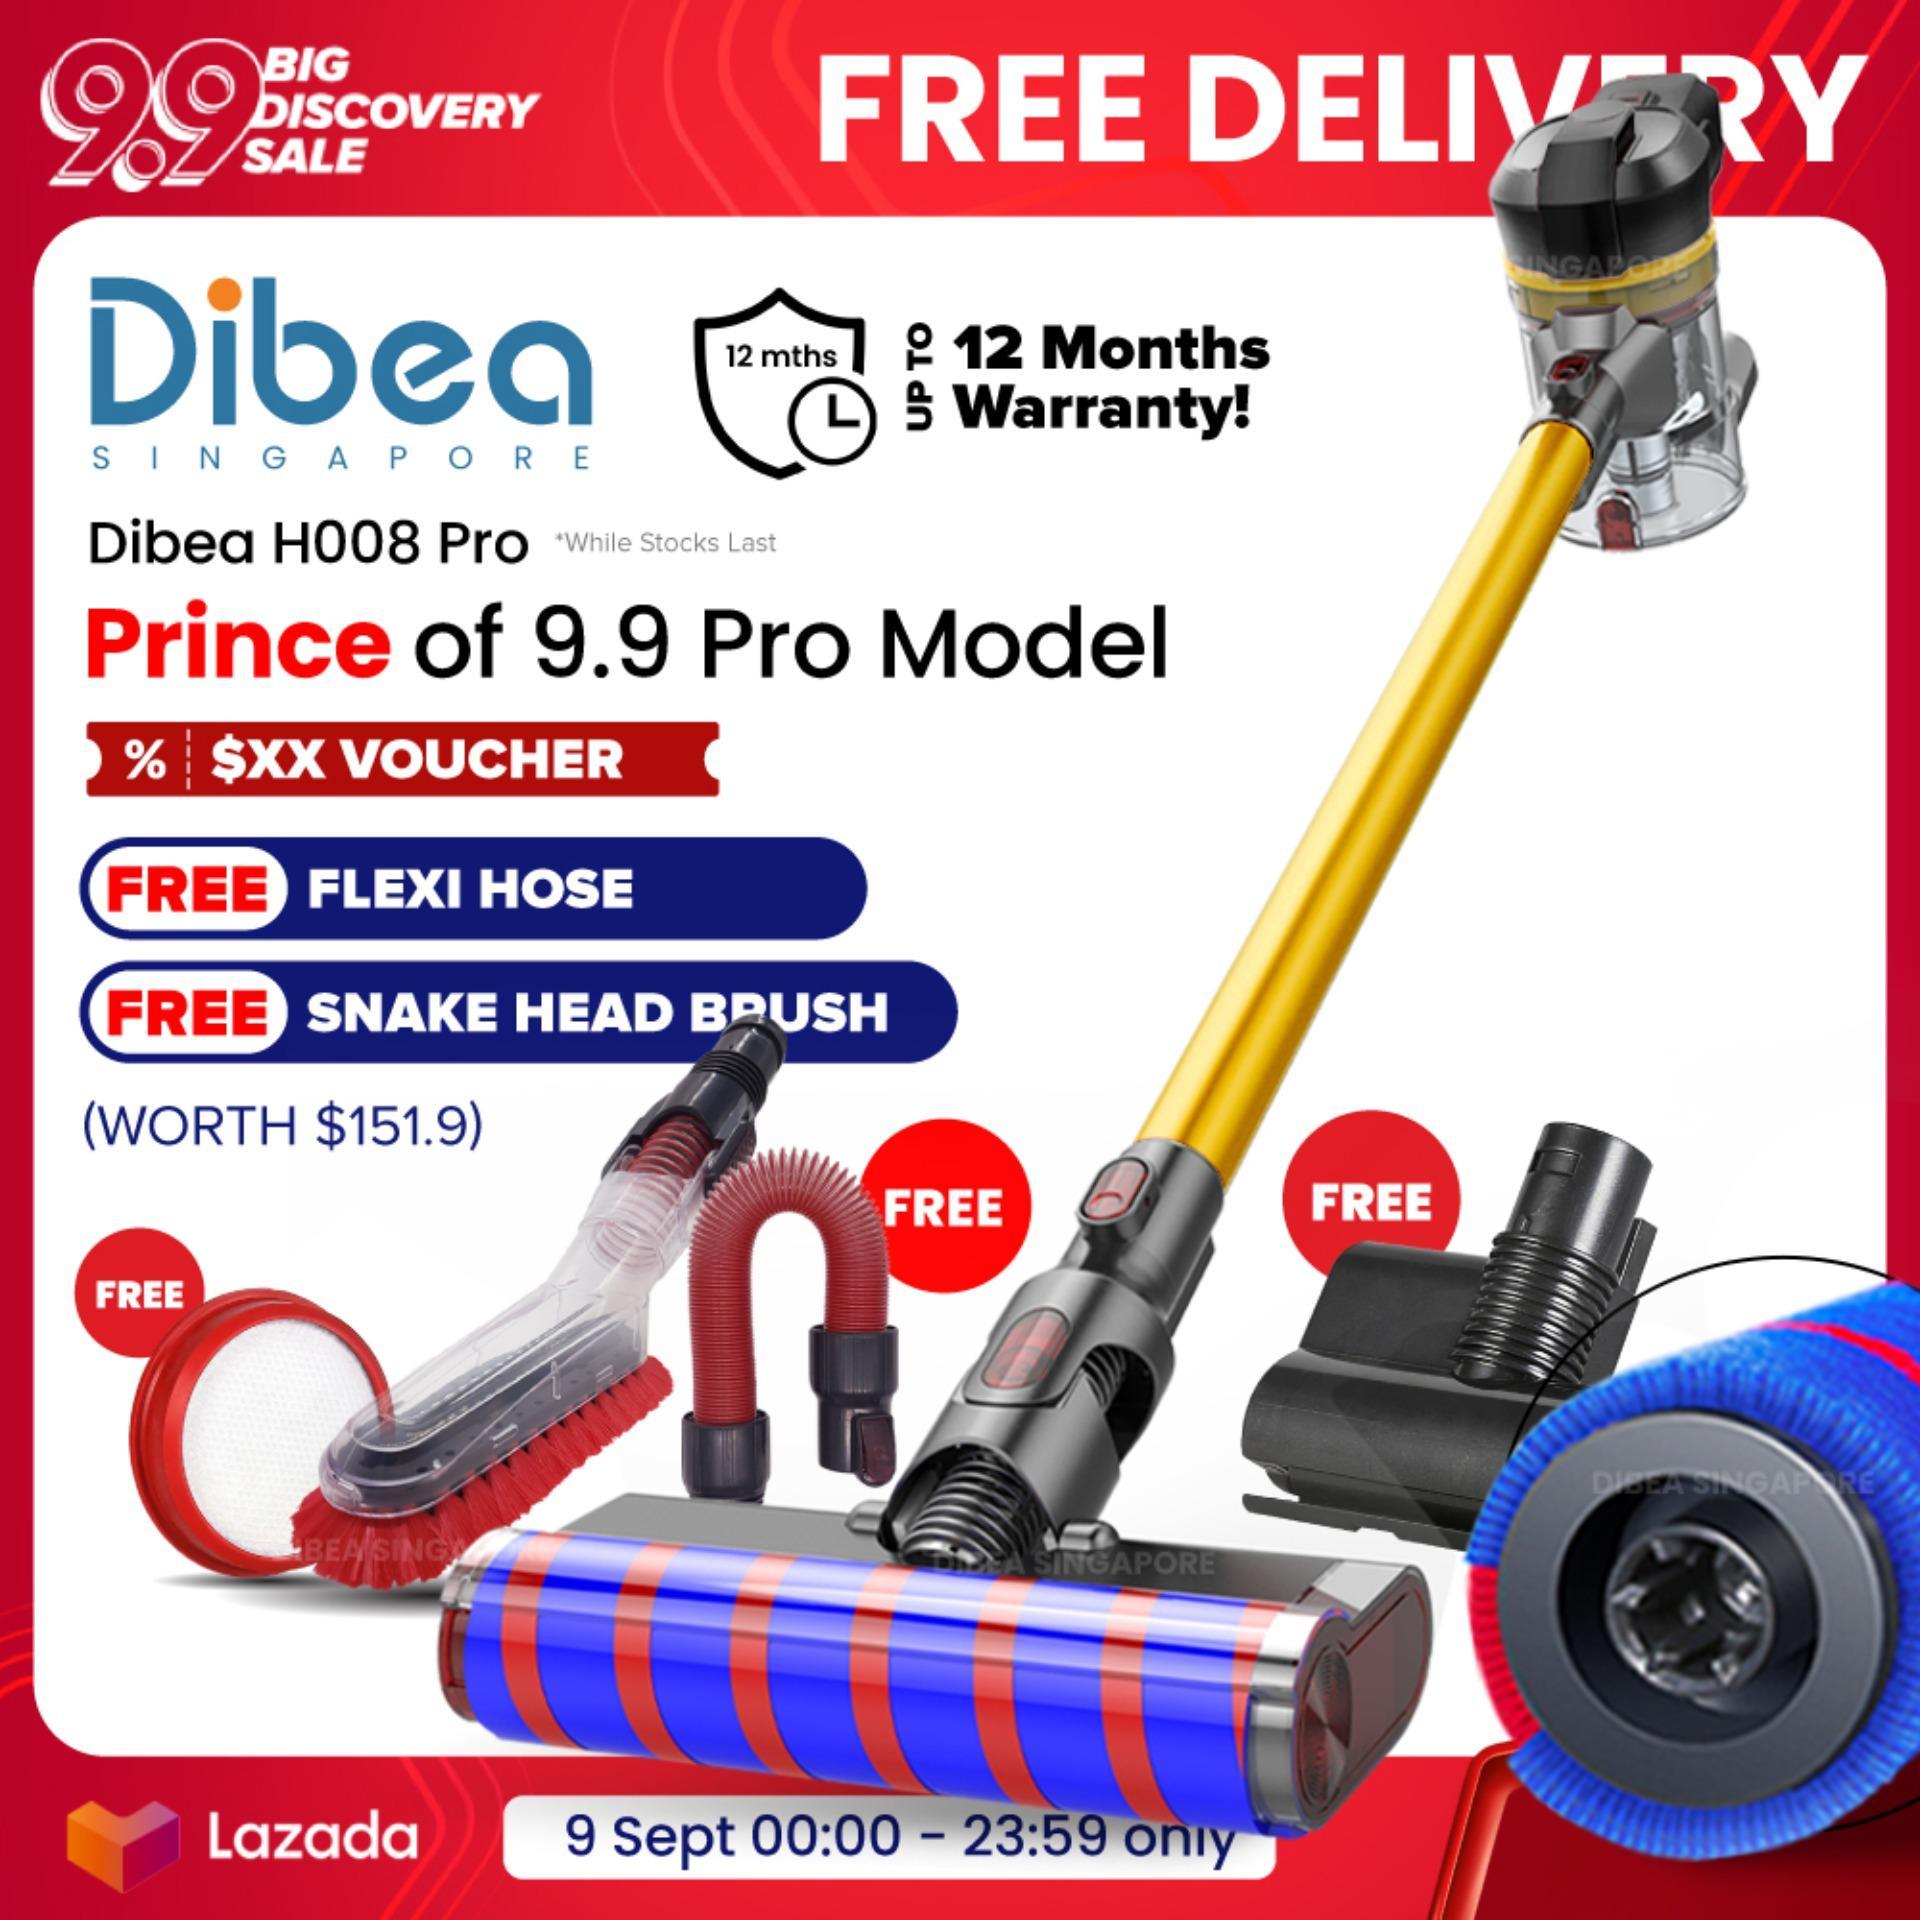 [ 9 9 Dibea Singapore] Dibea H008 Pro Cordless Vacuum Cleaner Handheld  Stick Large Capacity Household Appliances With Vacuum Cleaner Brush Safety  Mark